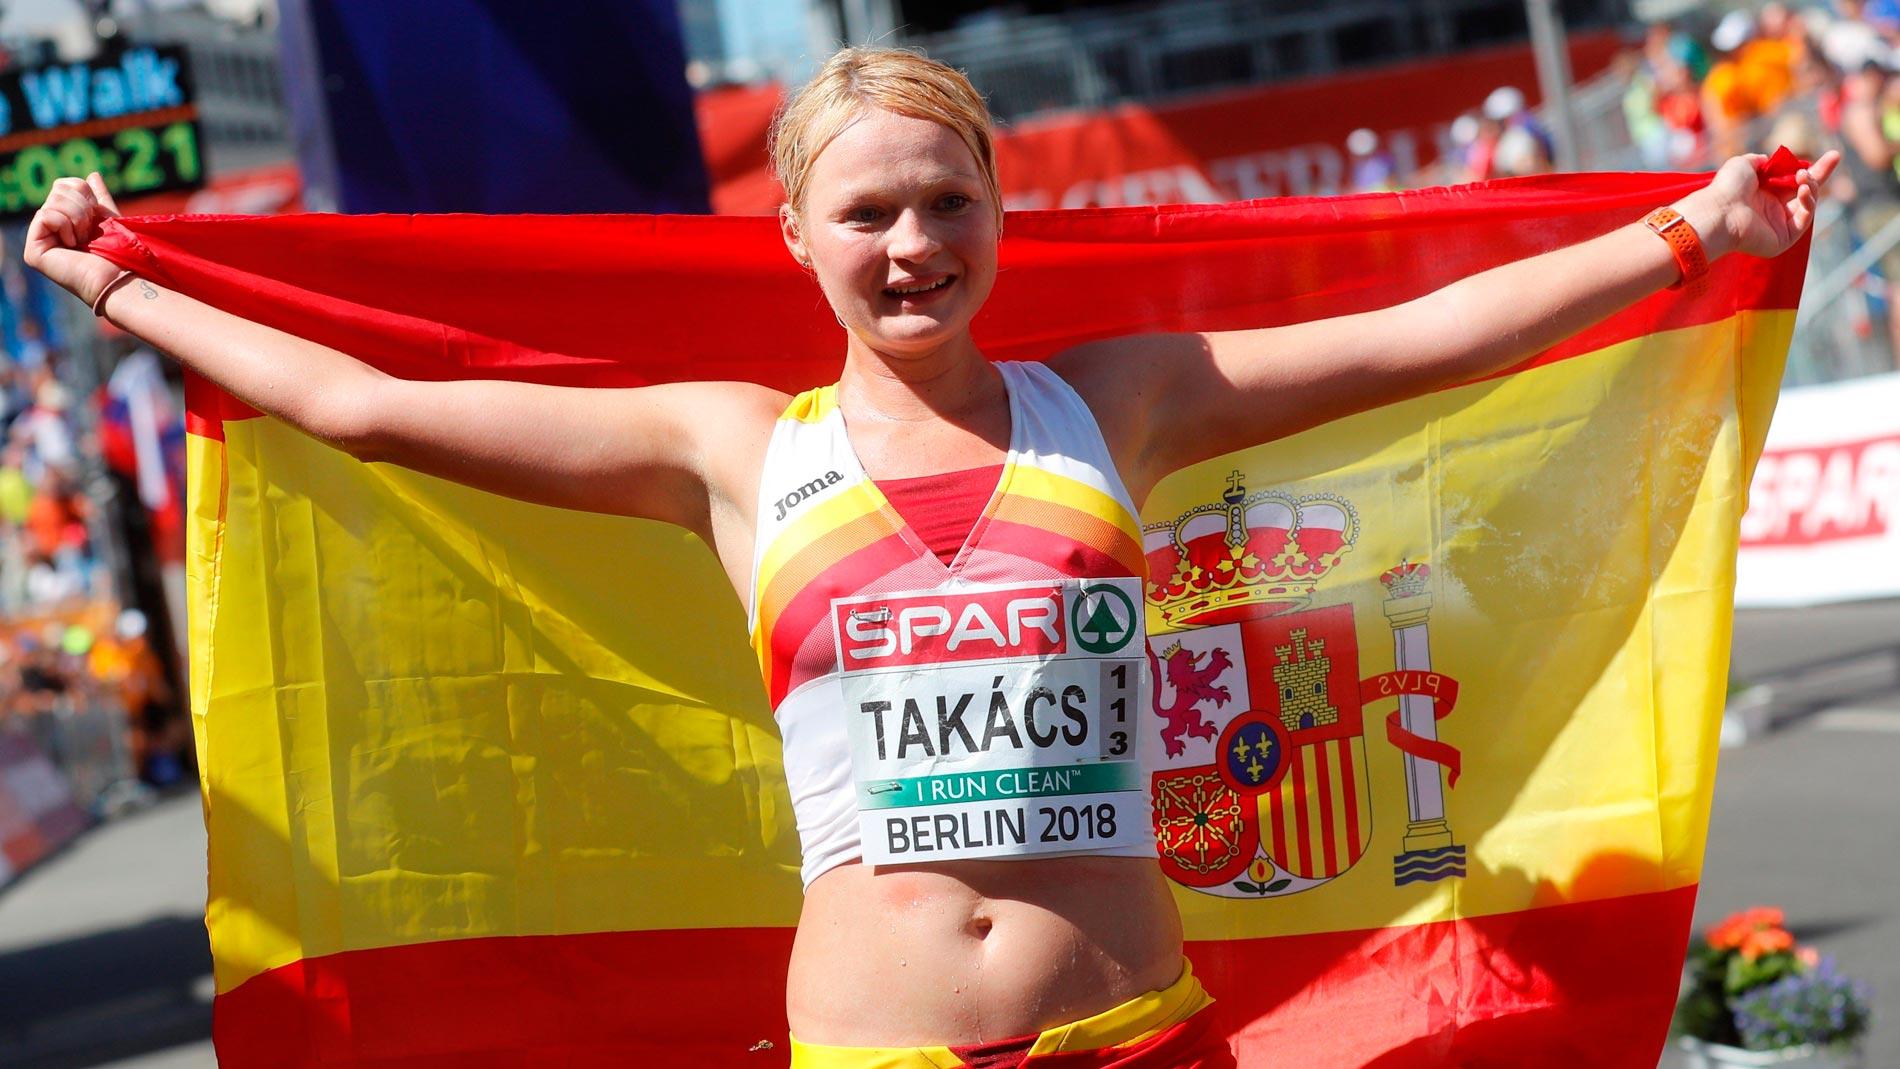 European Championships Julia Takacs, bronce en 50 km marcha, primera medalla española de atletismo